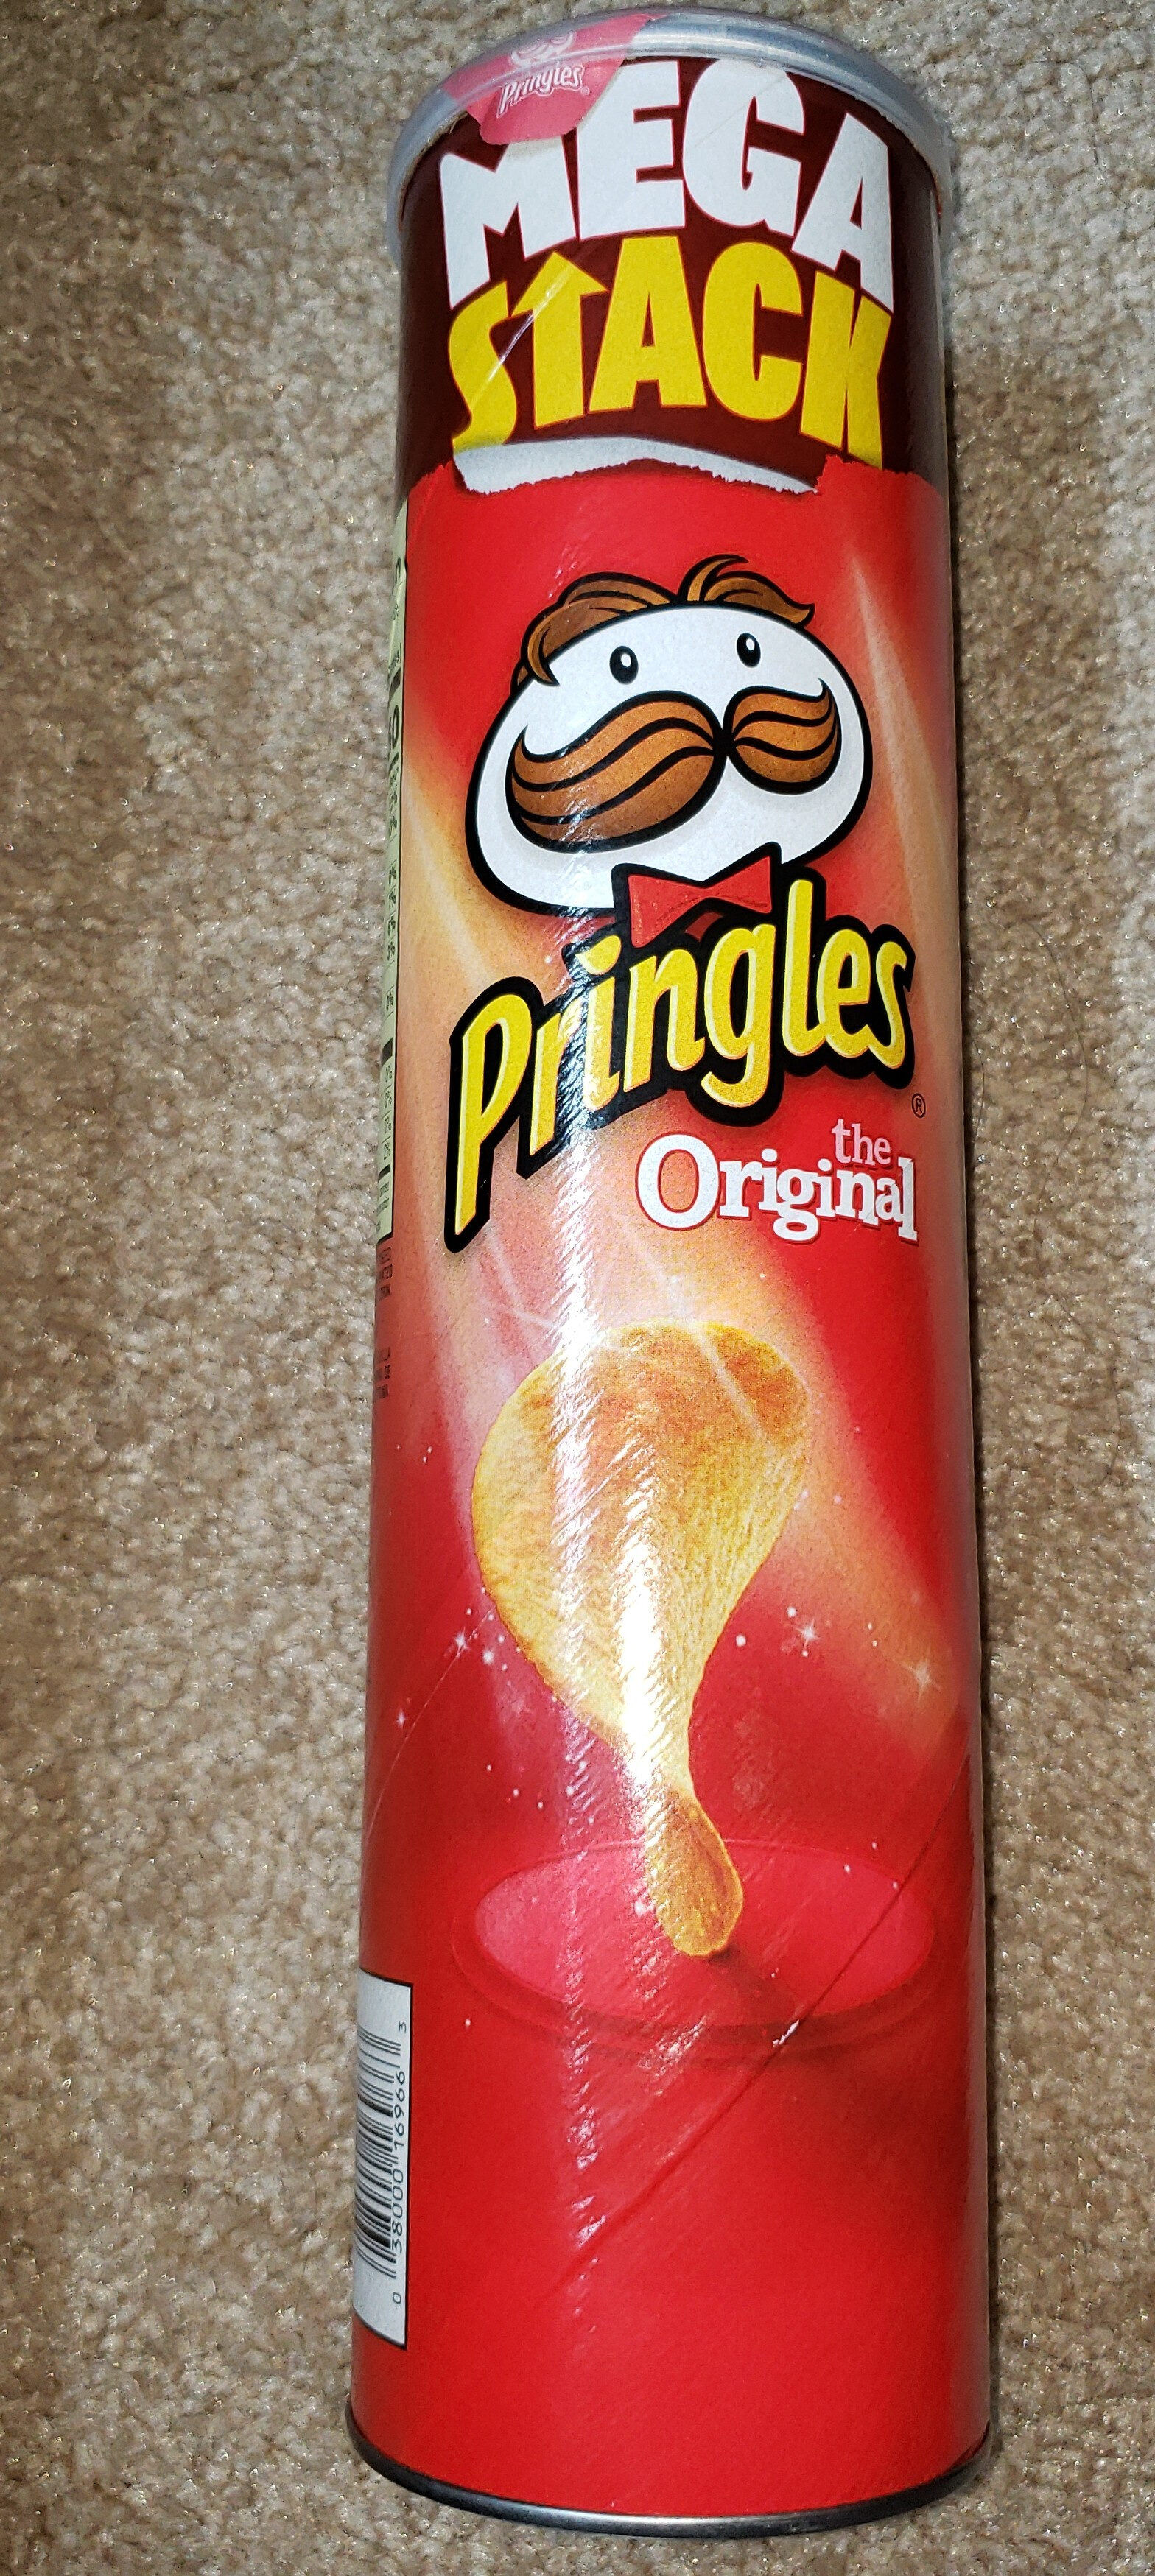 The original potato chips, the original - Product - en